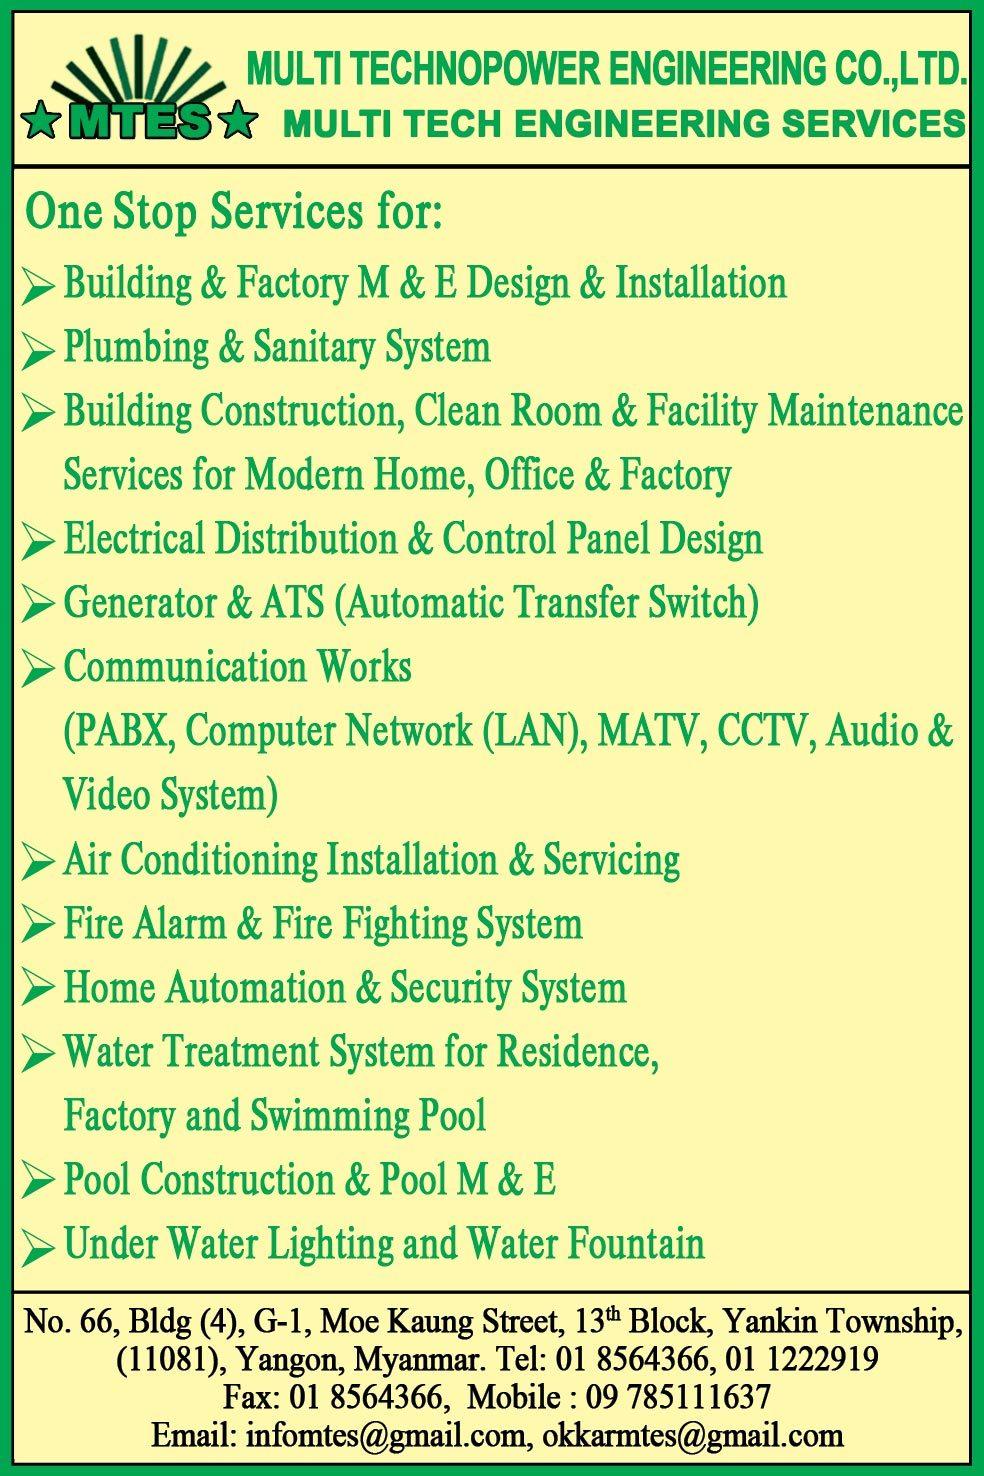 Multi-Technopower-Engineering-Co-Ltd_Construction-Services_814.jpg